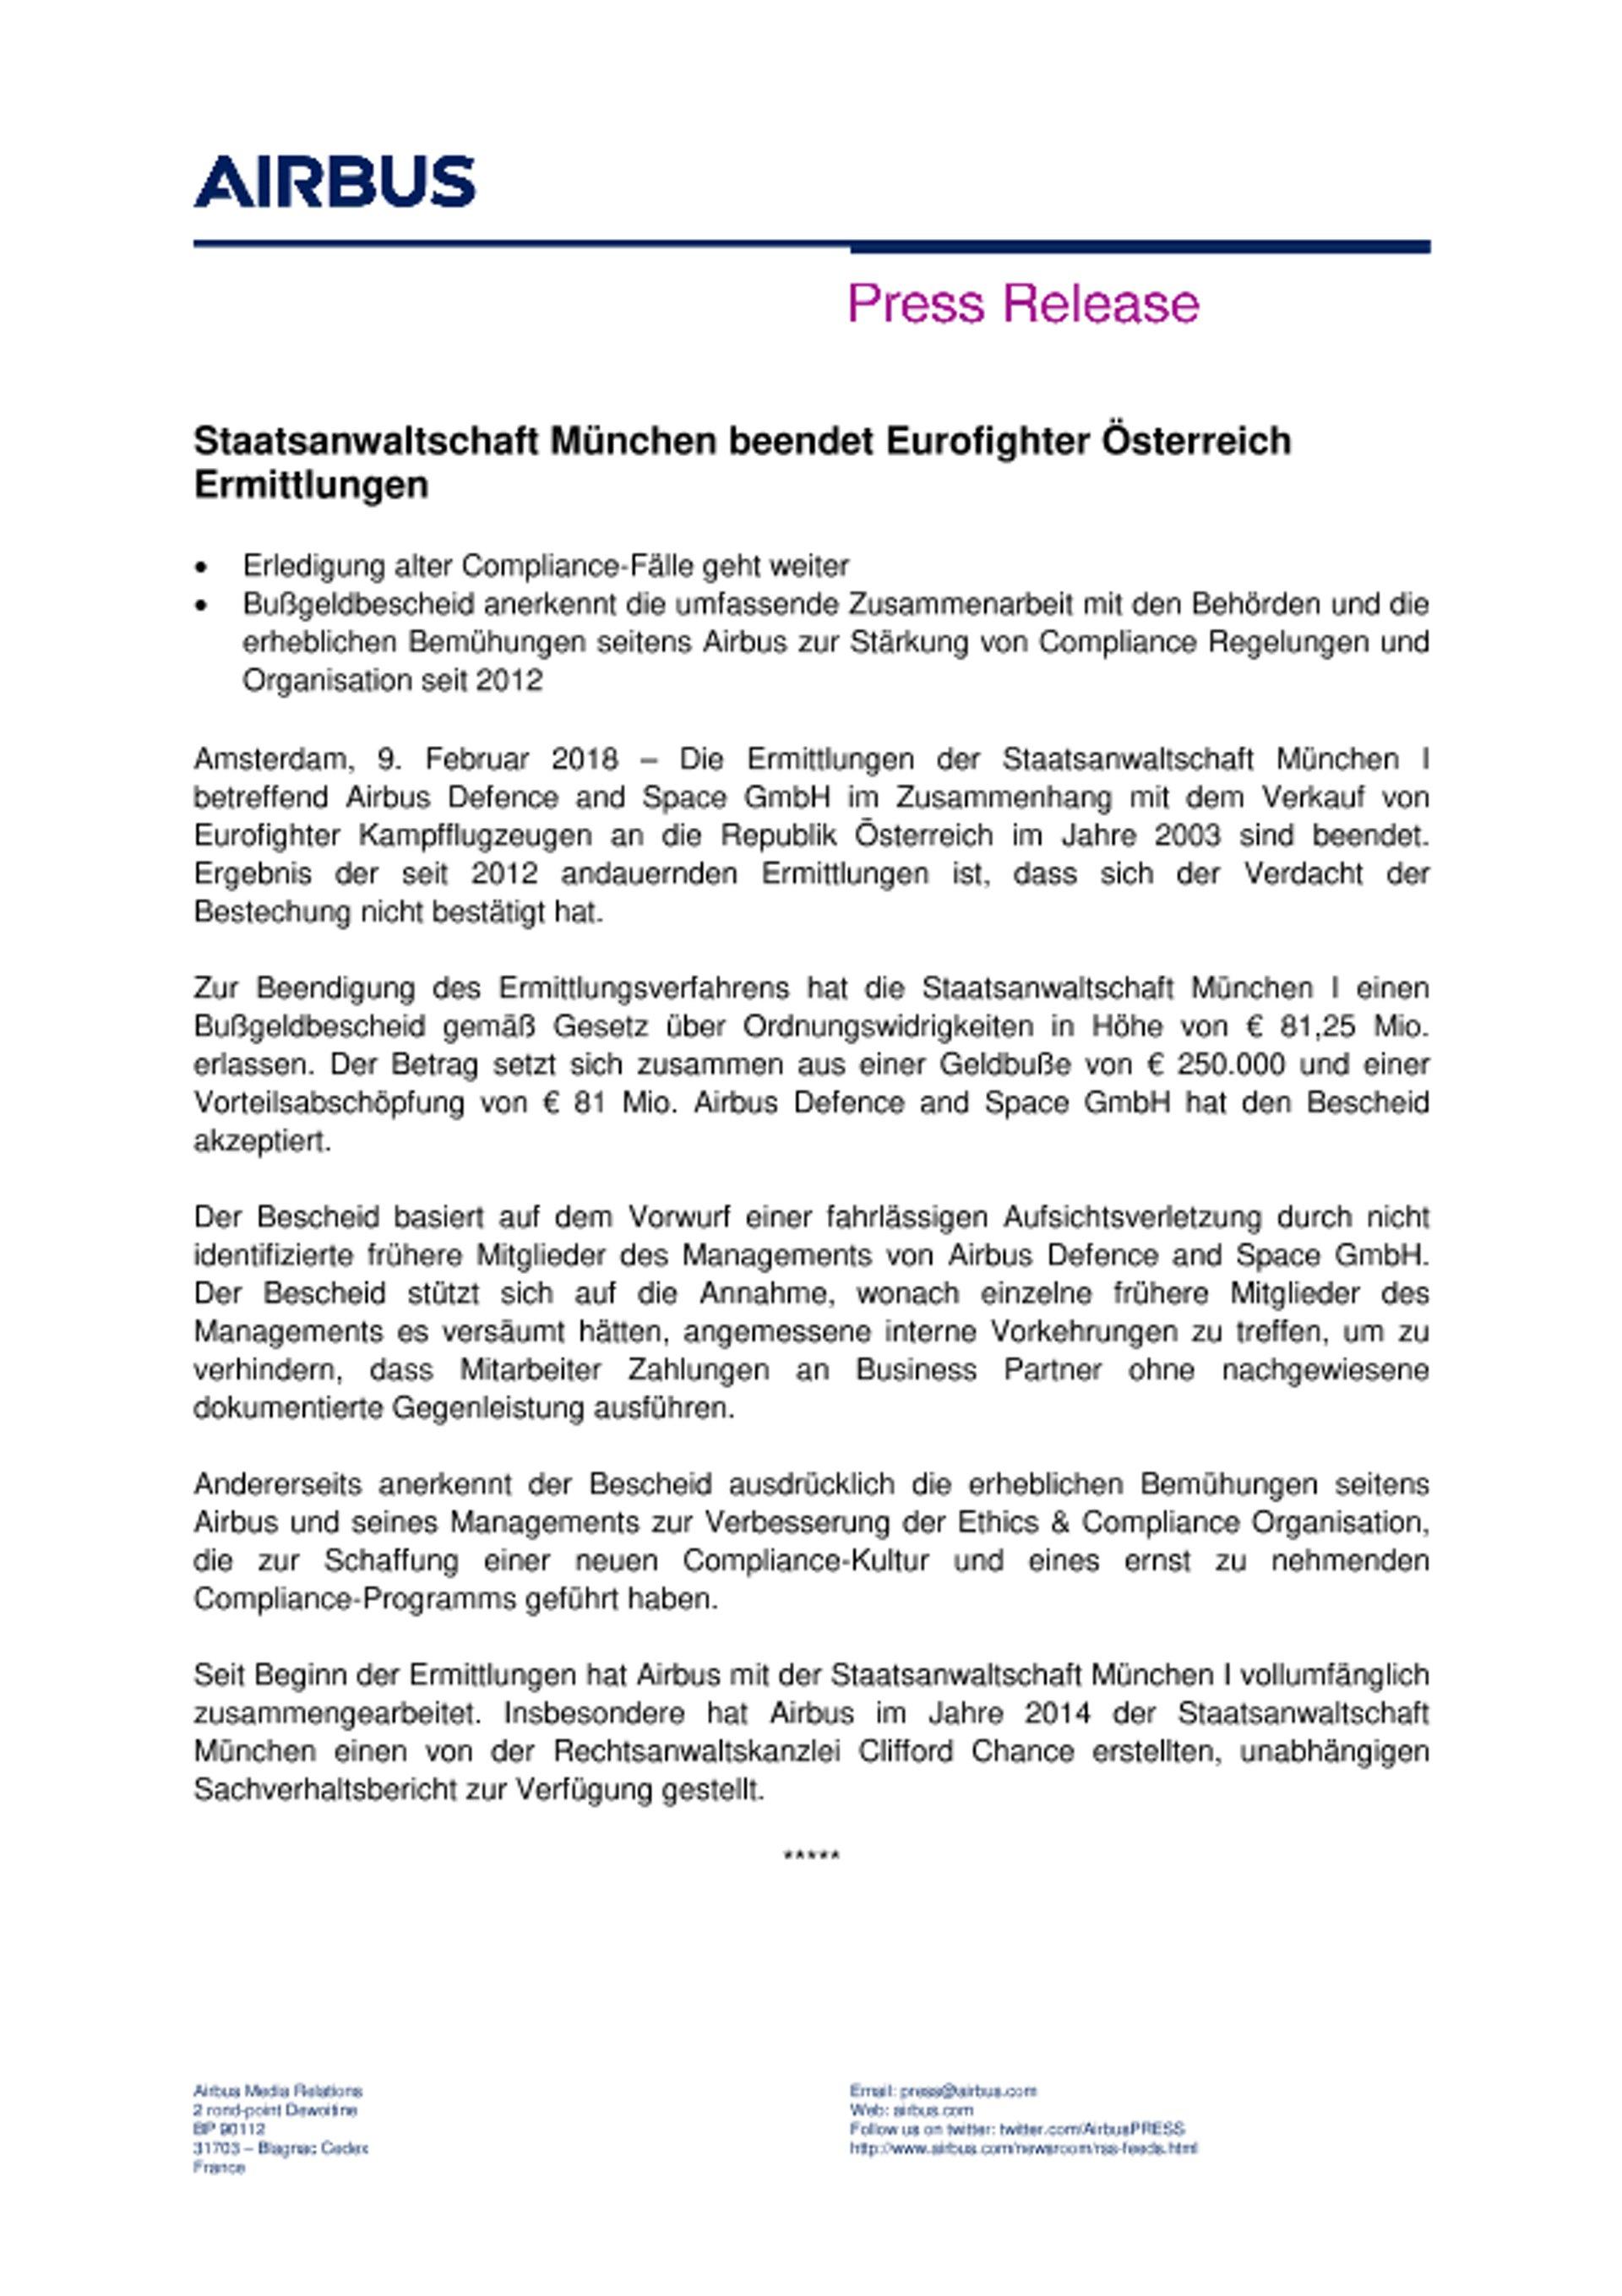 DE Press Release -  Eurofighter Austria